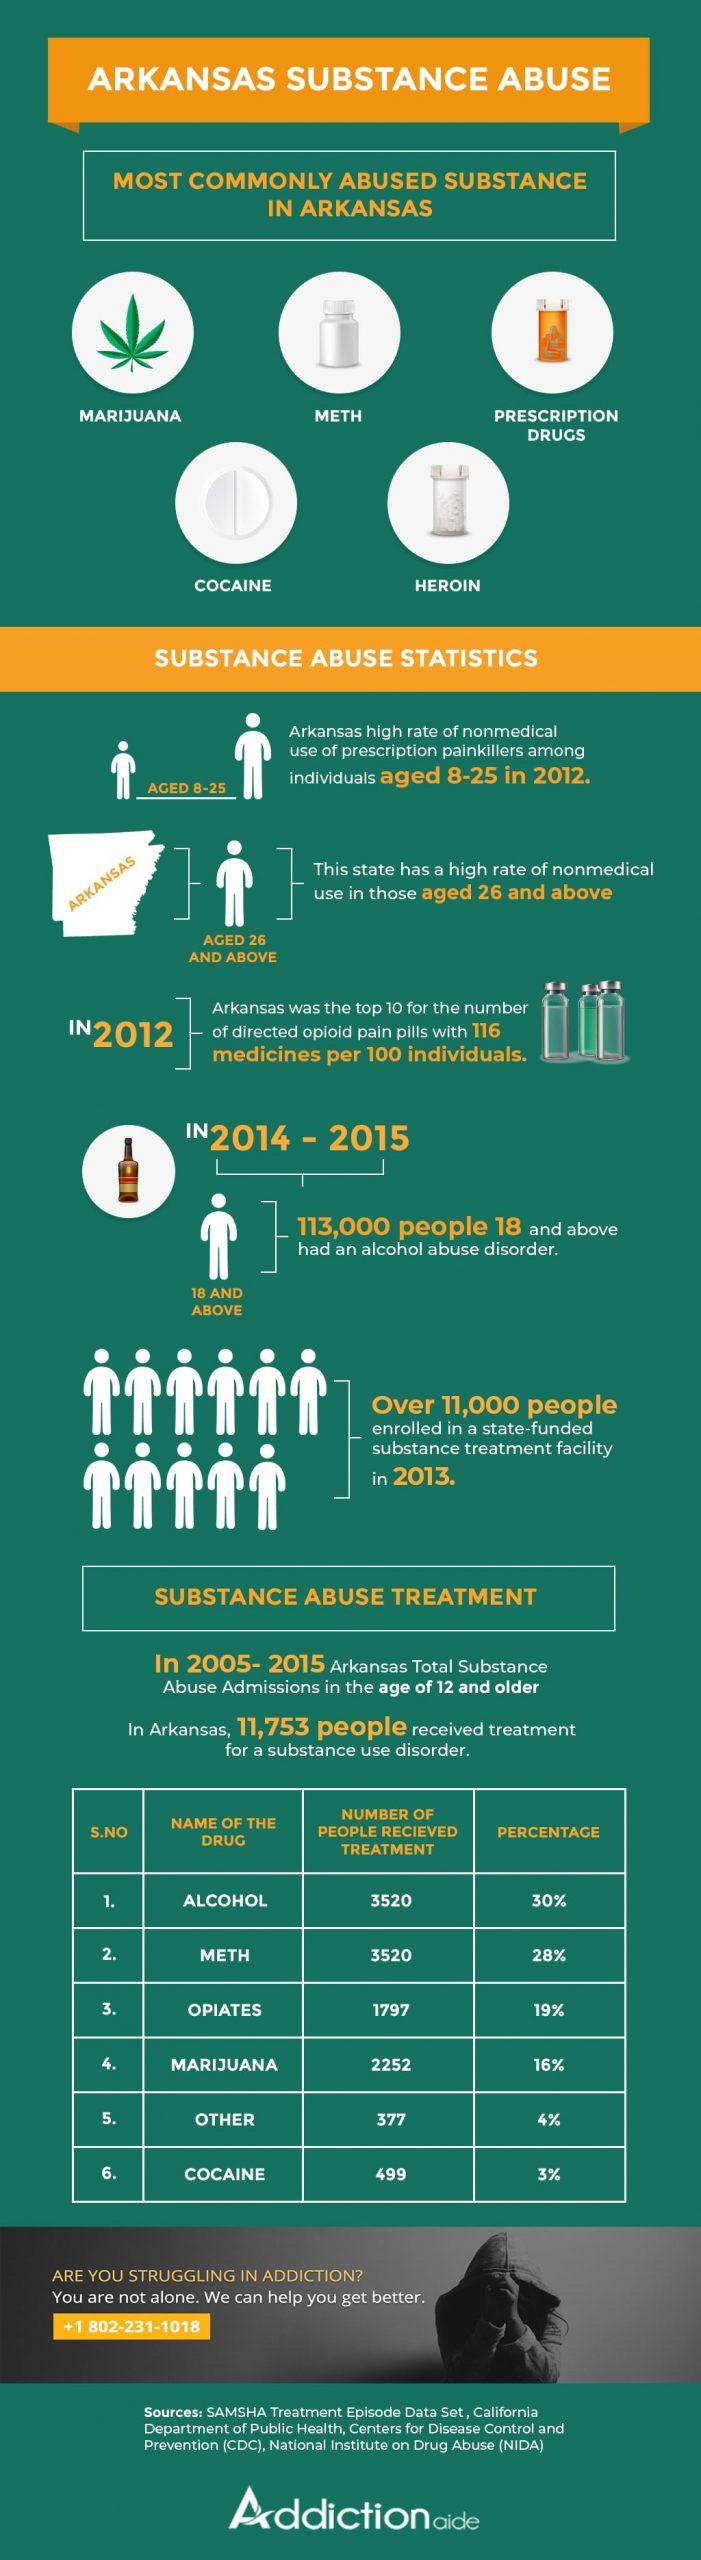 Arkansas-substance-abuse